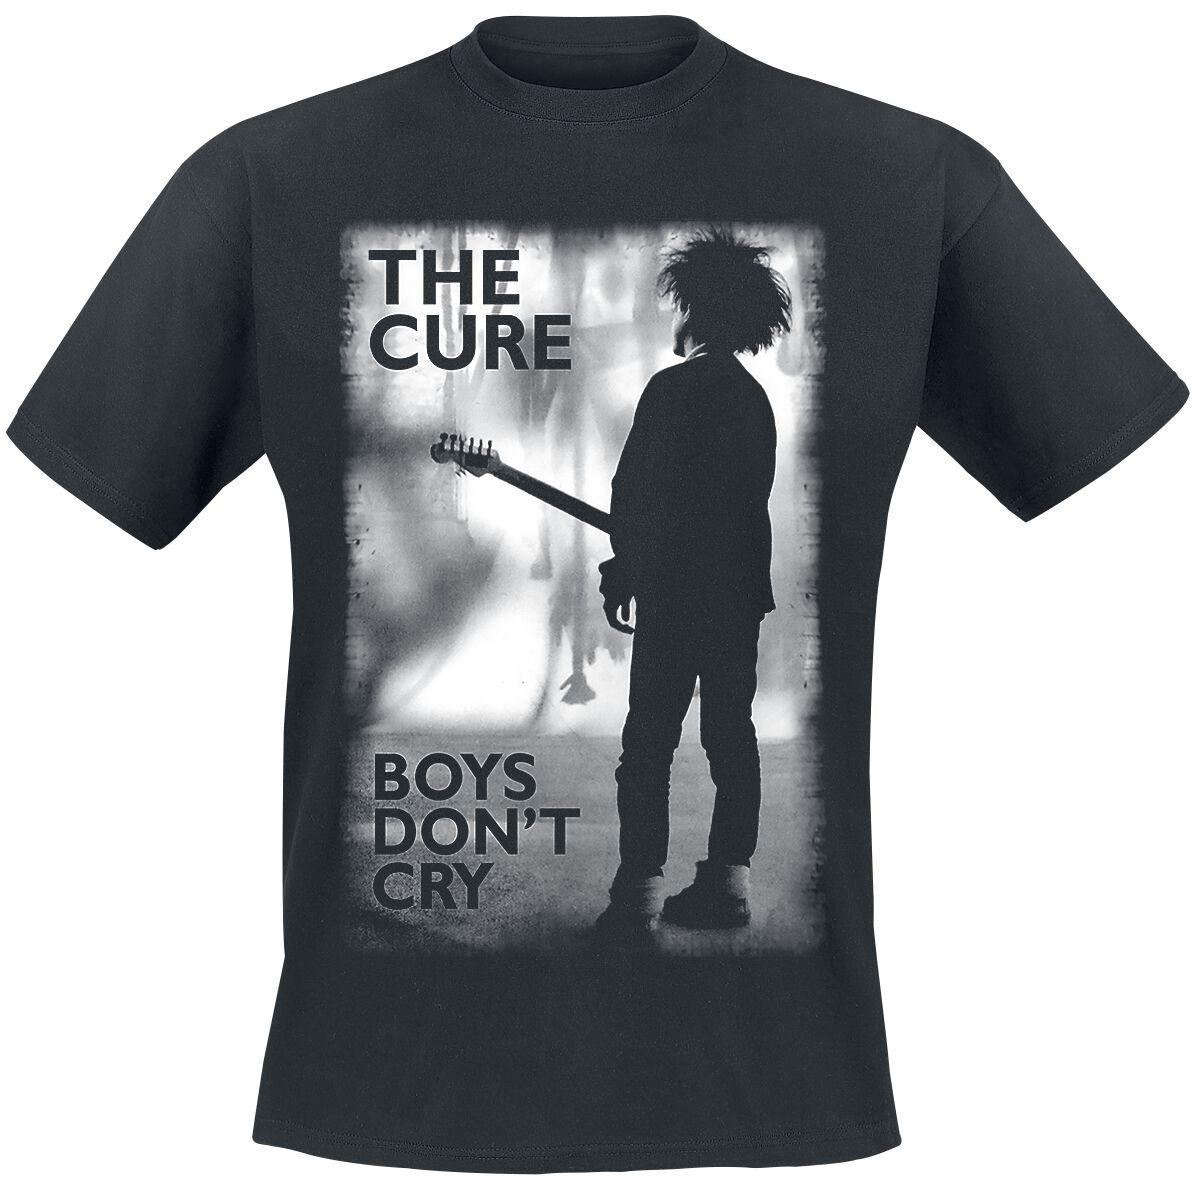 Zespoły - Koszulki - T-Shirt The Cure Boys Don't Cry T-Shirt czarny - 334625